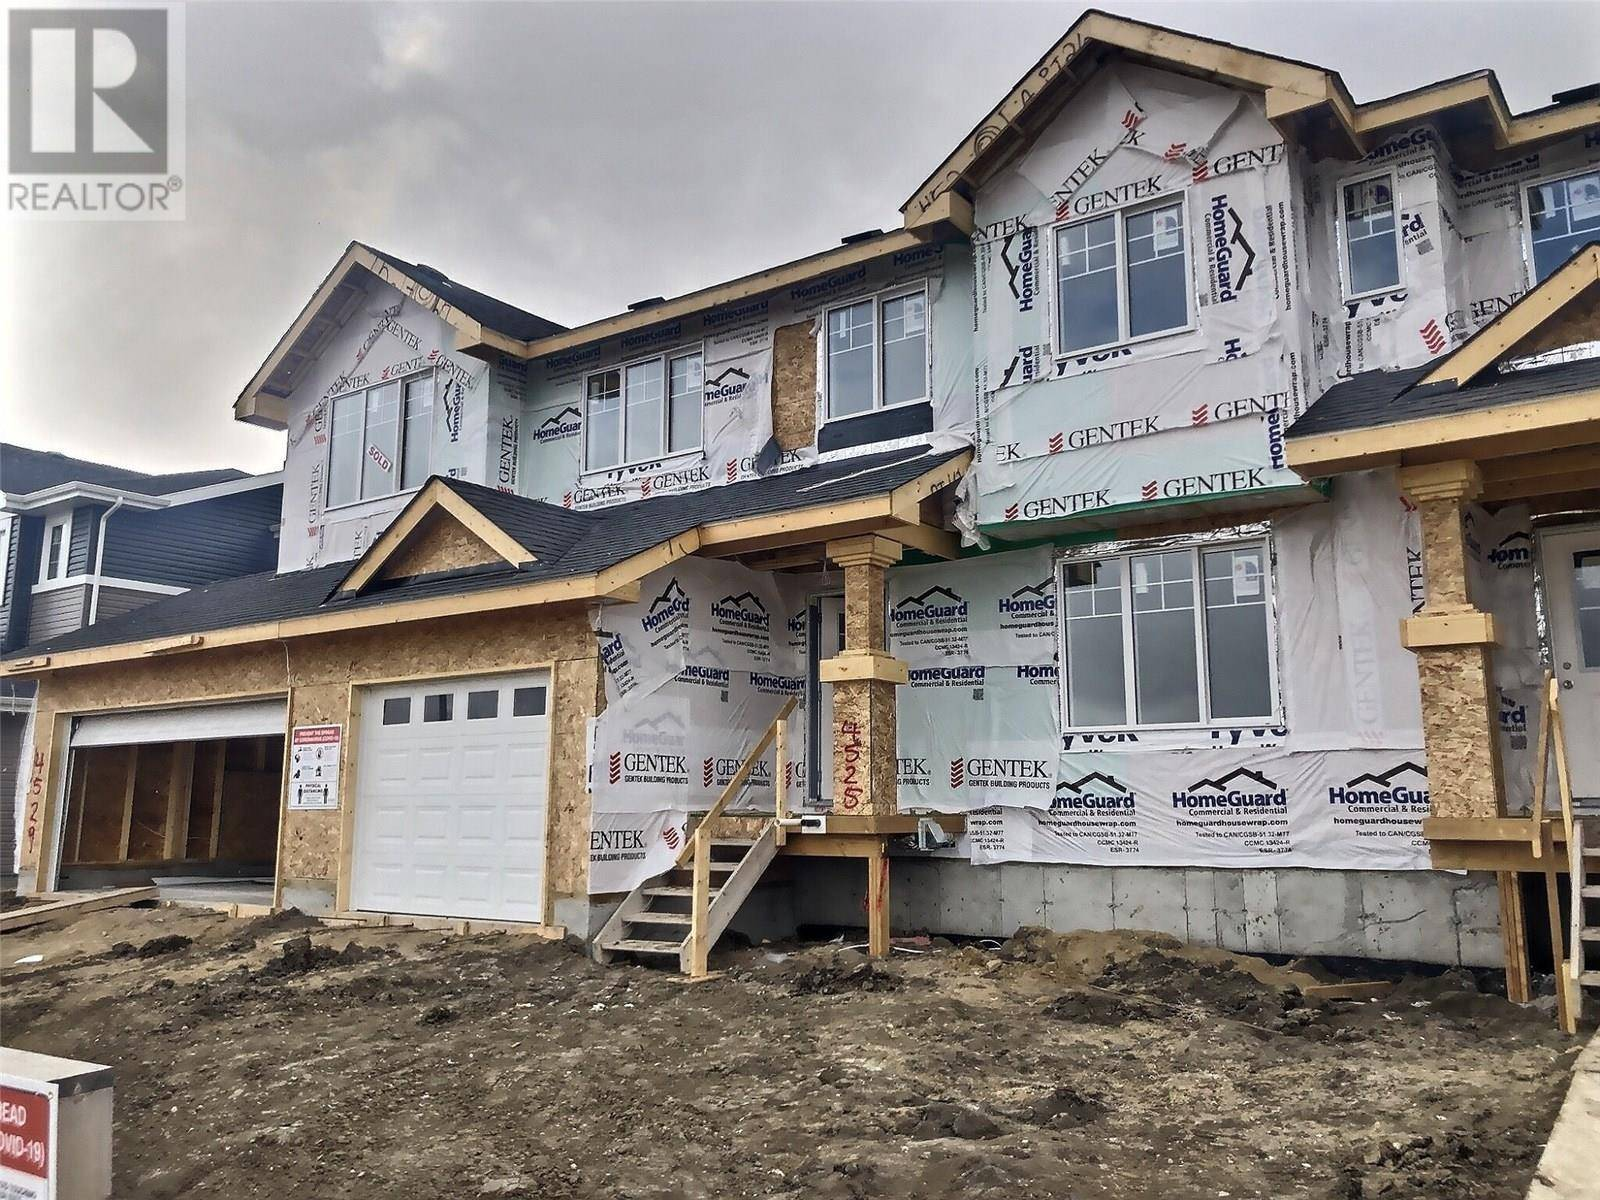 Townhouse for sale at 4525 Keller Ave E Regina Saskatchewan - MLS: SK801559